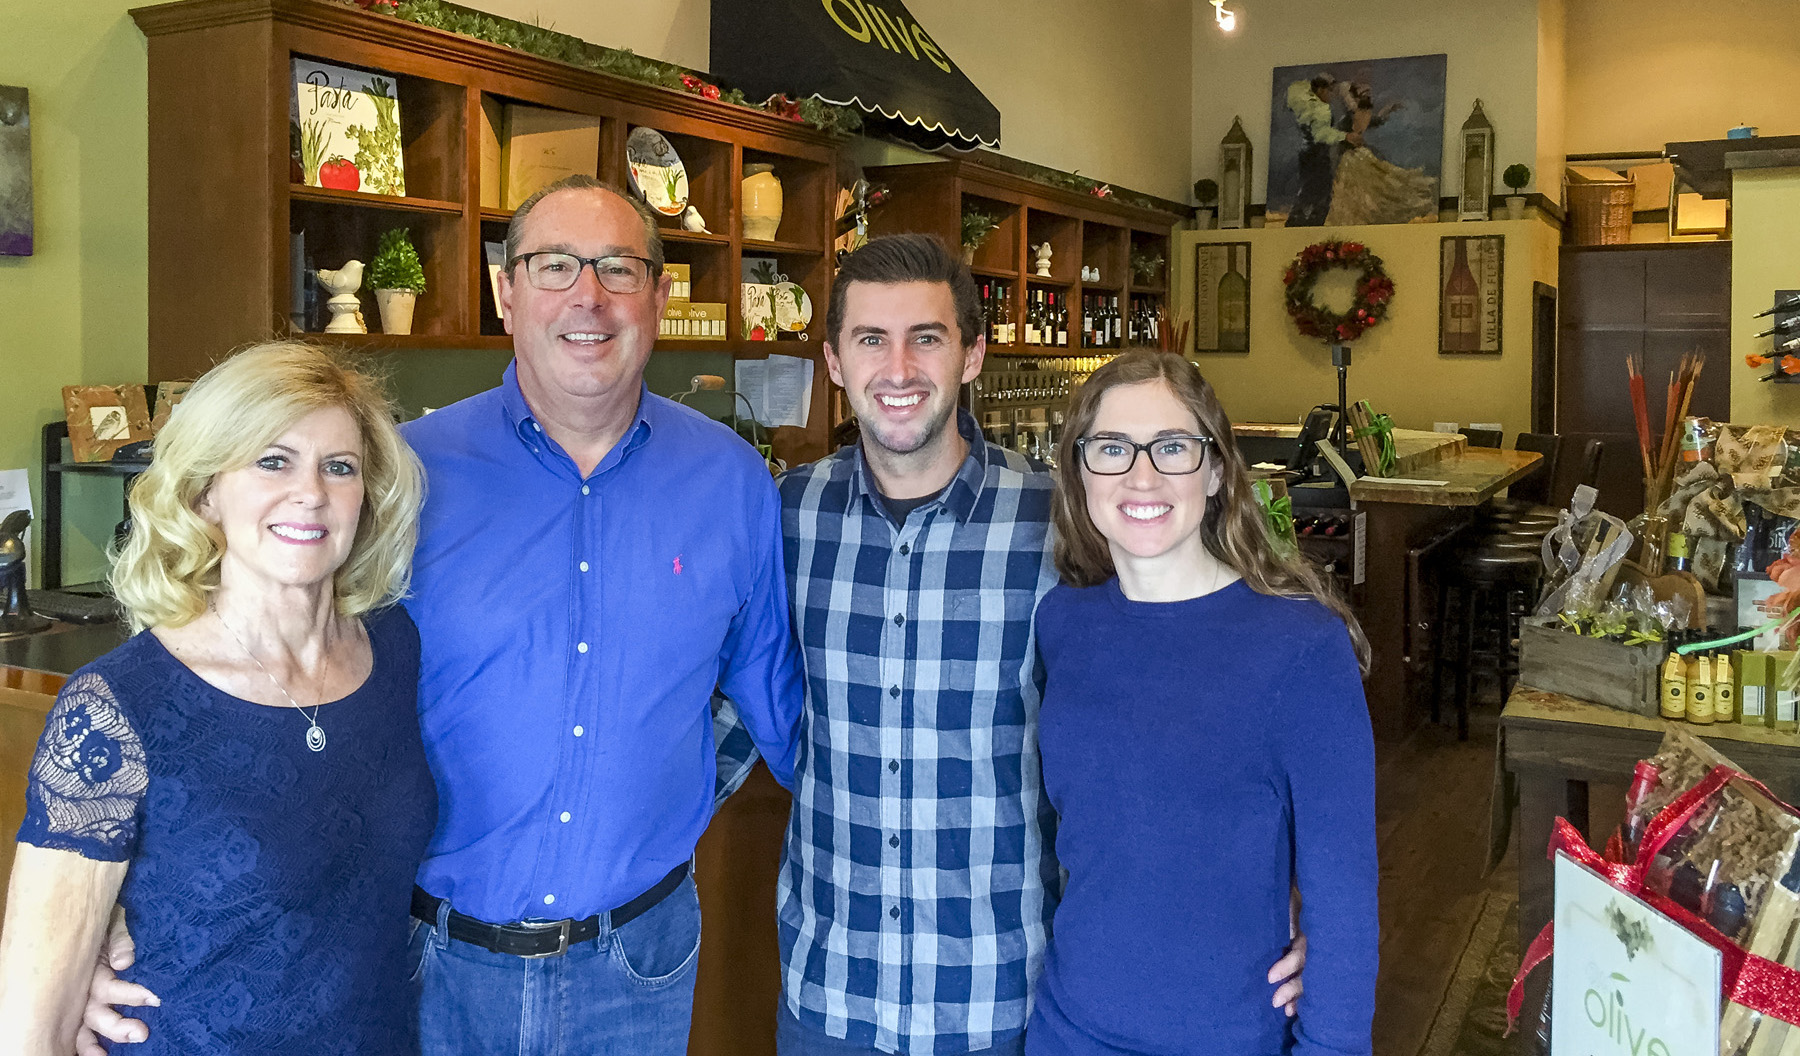 Szubielski family at their We Olive and Wine Bar, San Juan Capistrano